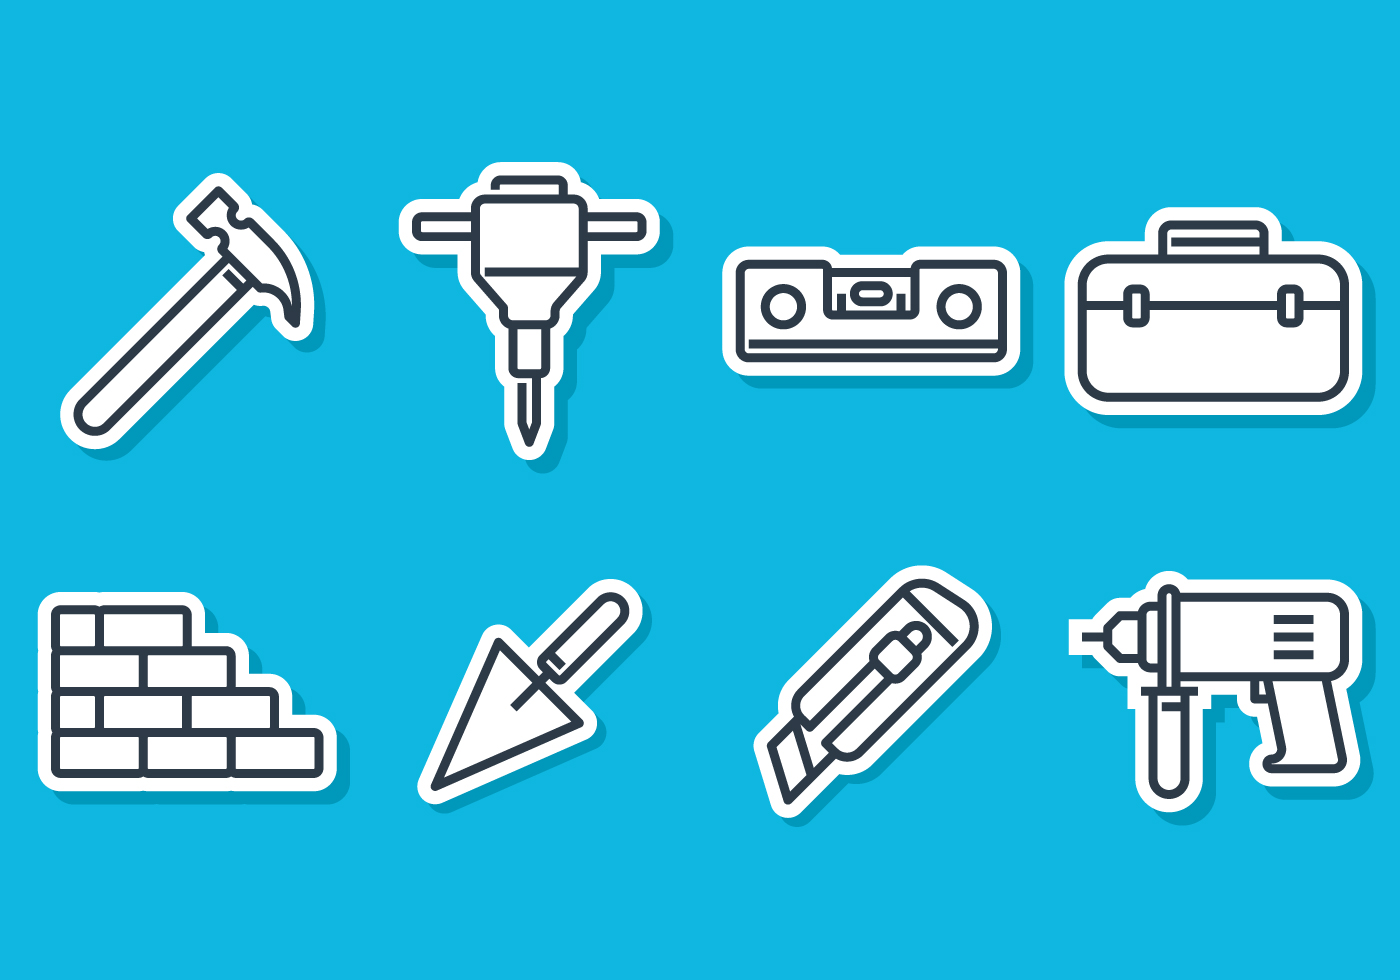 Construction Tools - Download Free Vector Art, Stock ...